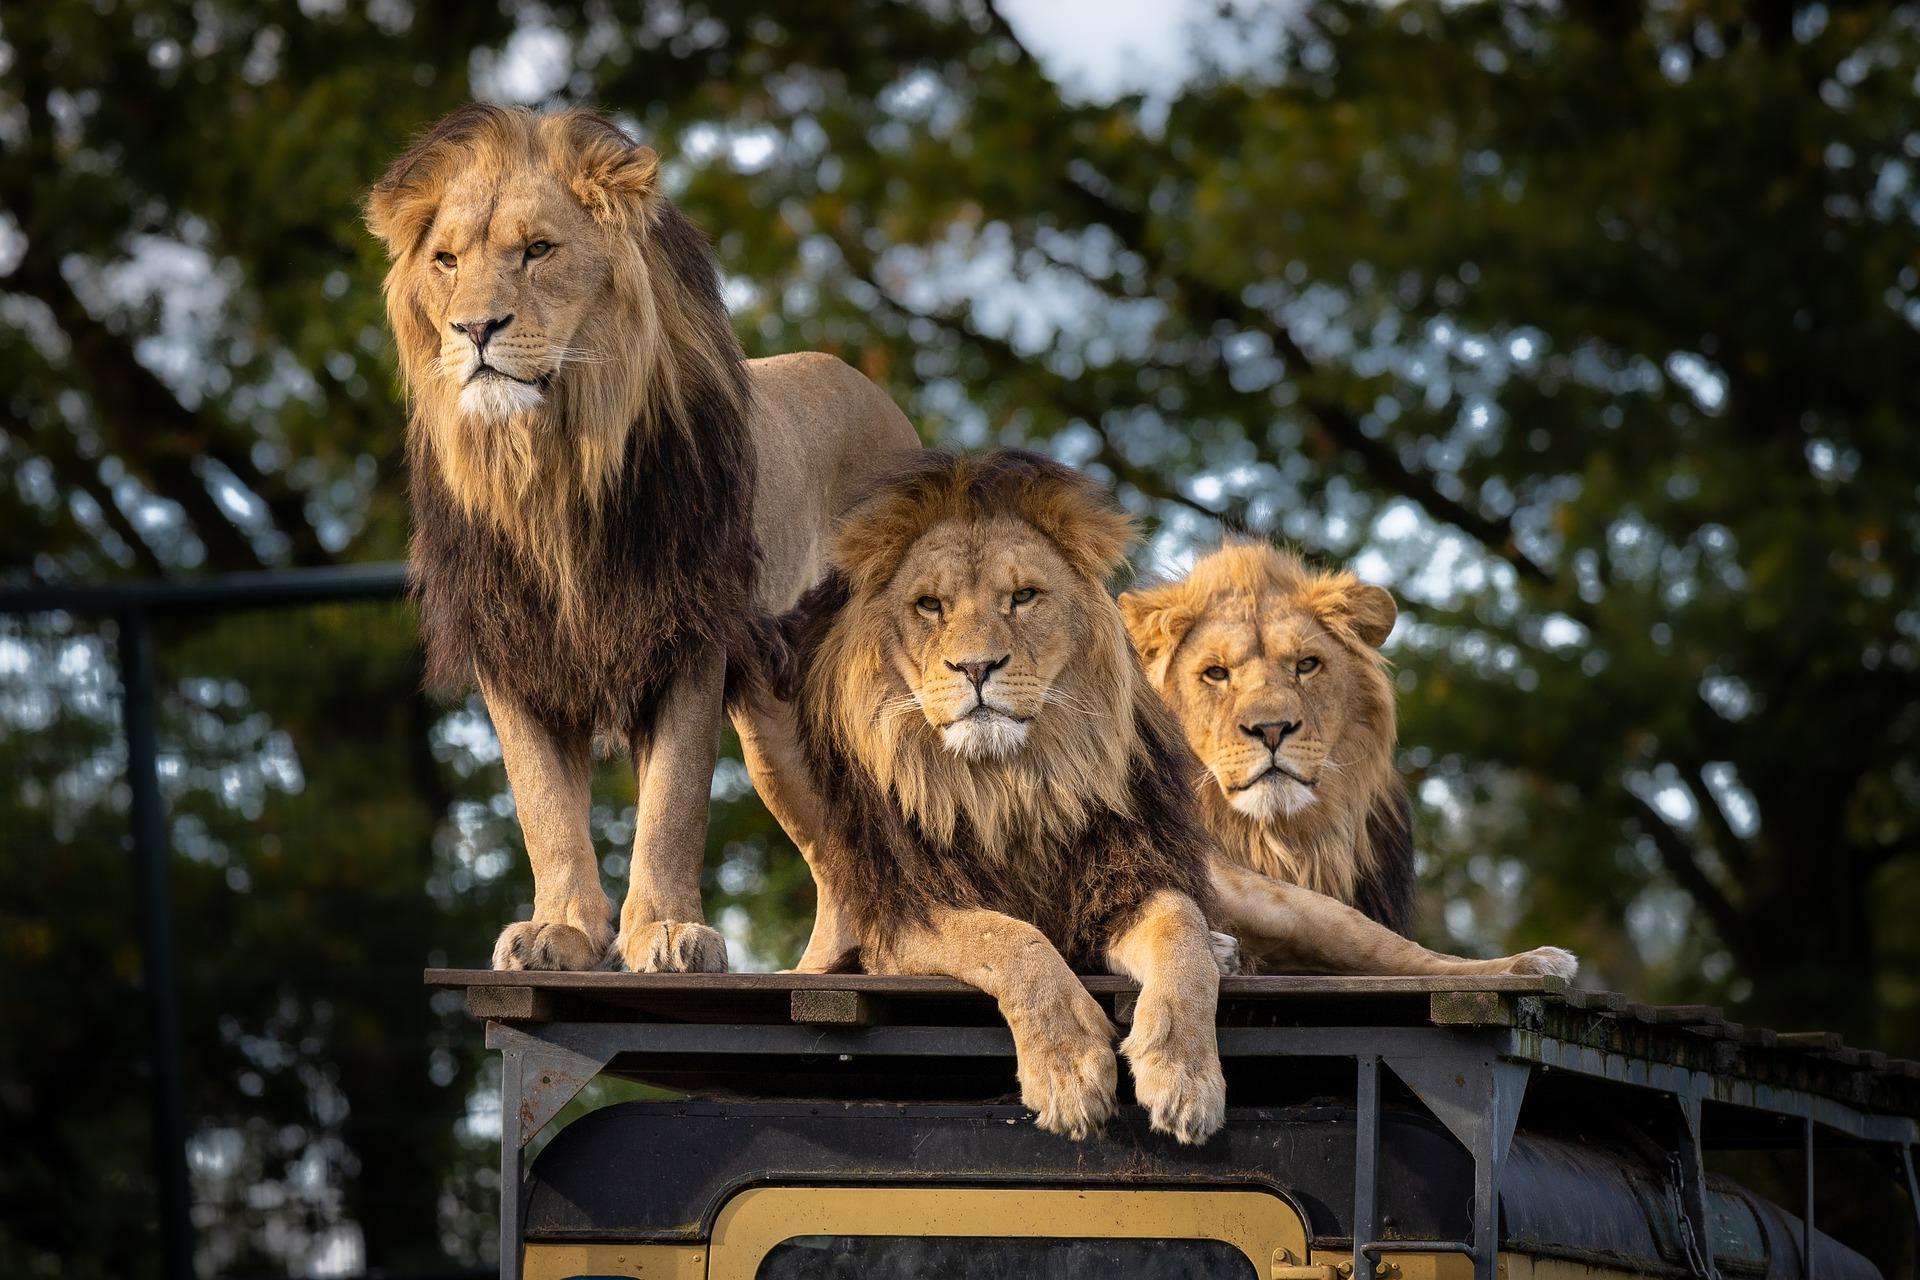 South Africa overlanding tour to Drakensburg and Kruger Park